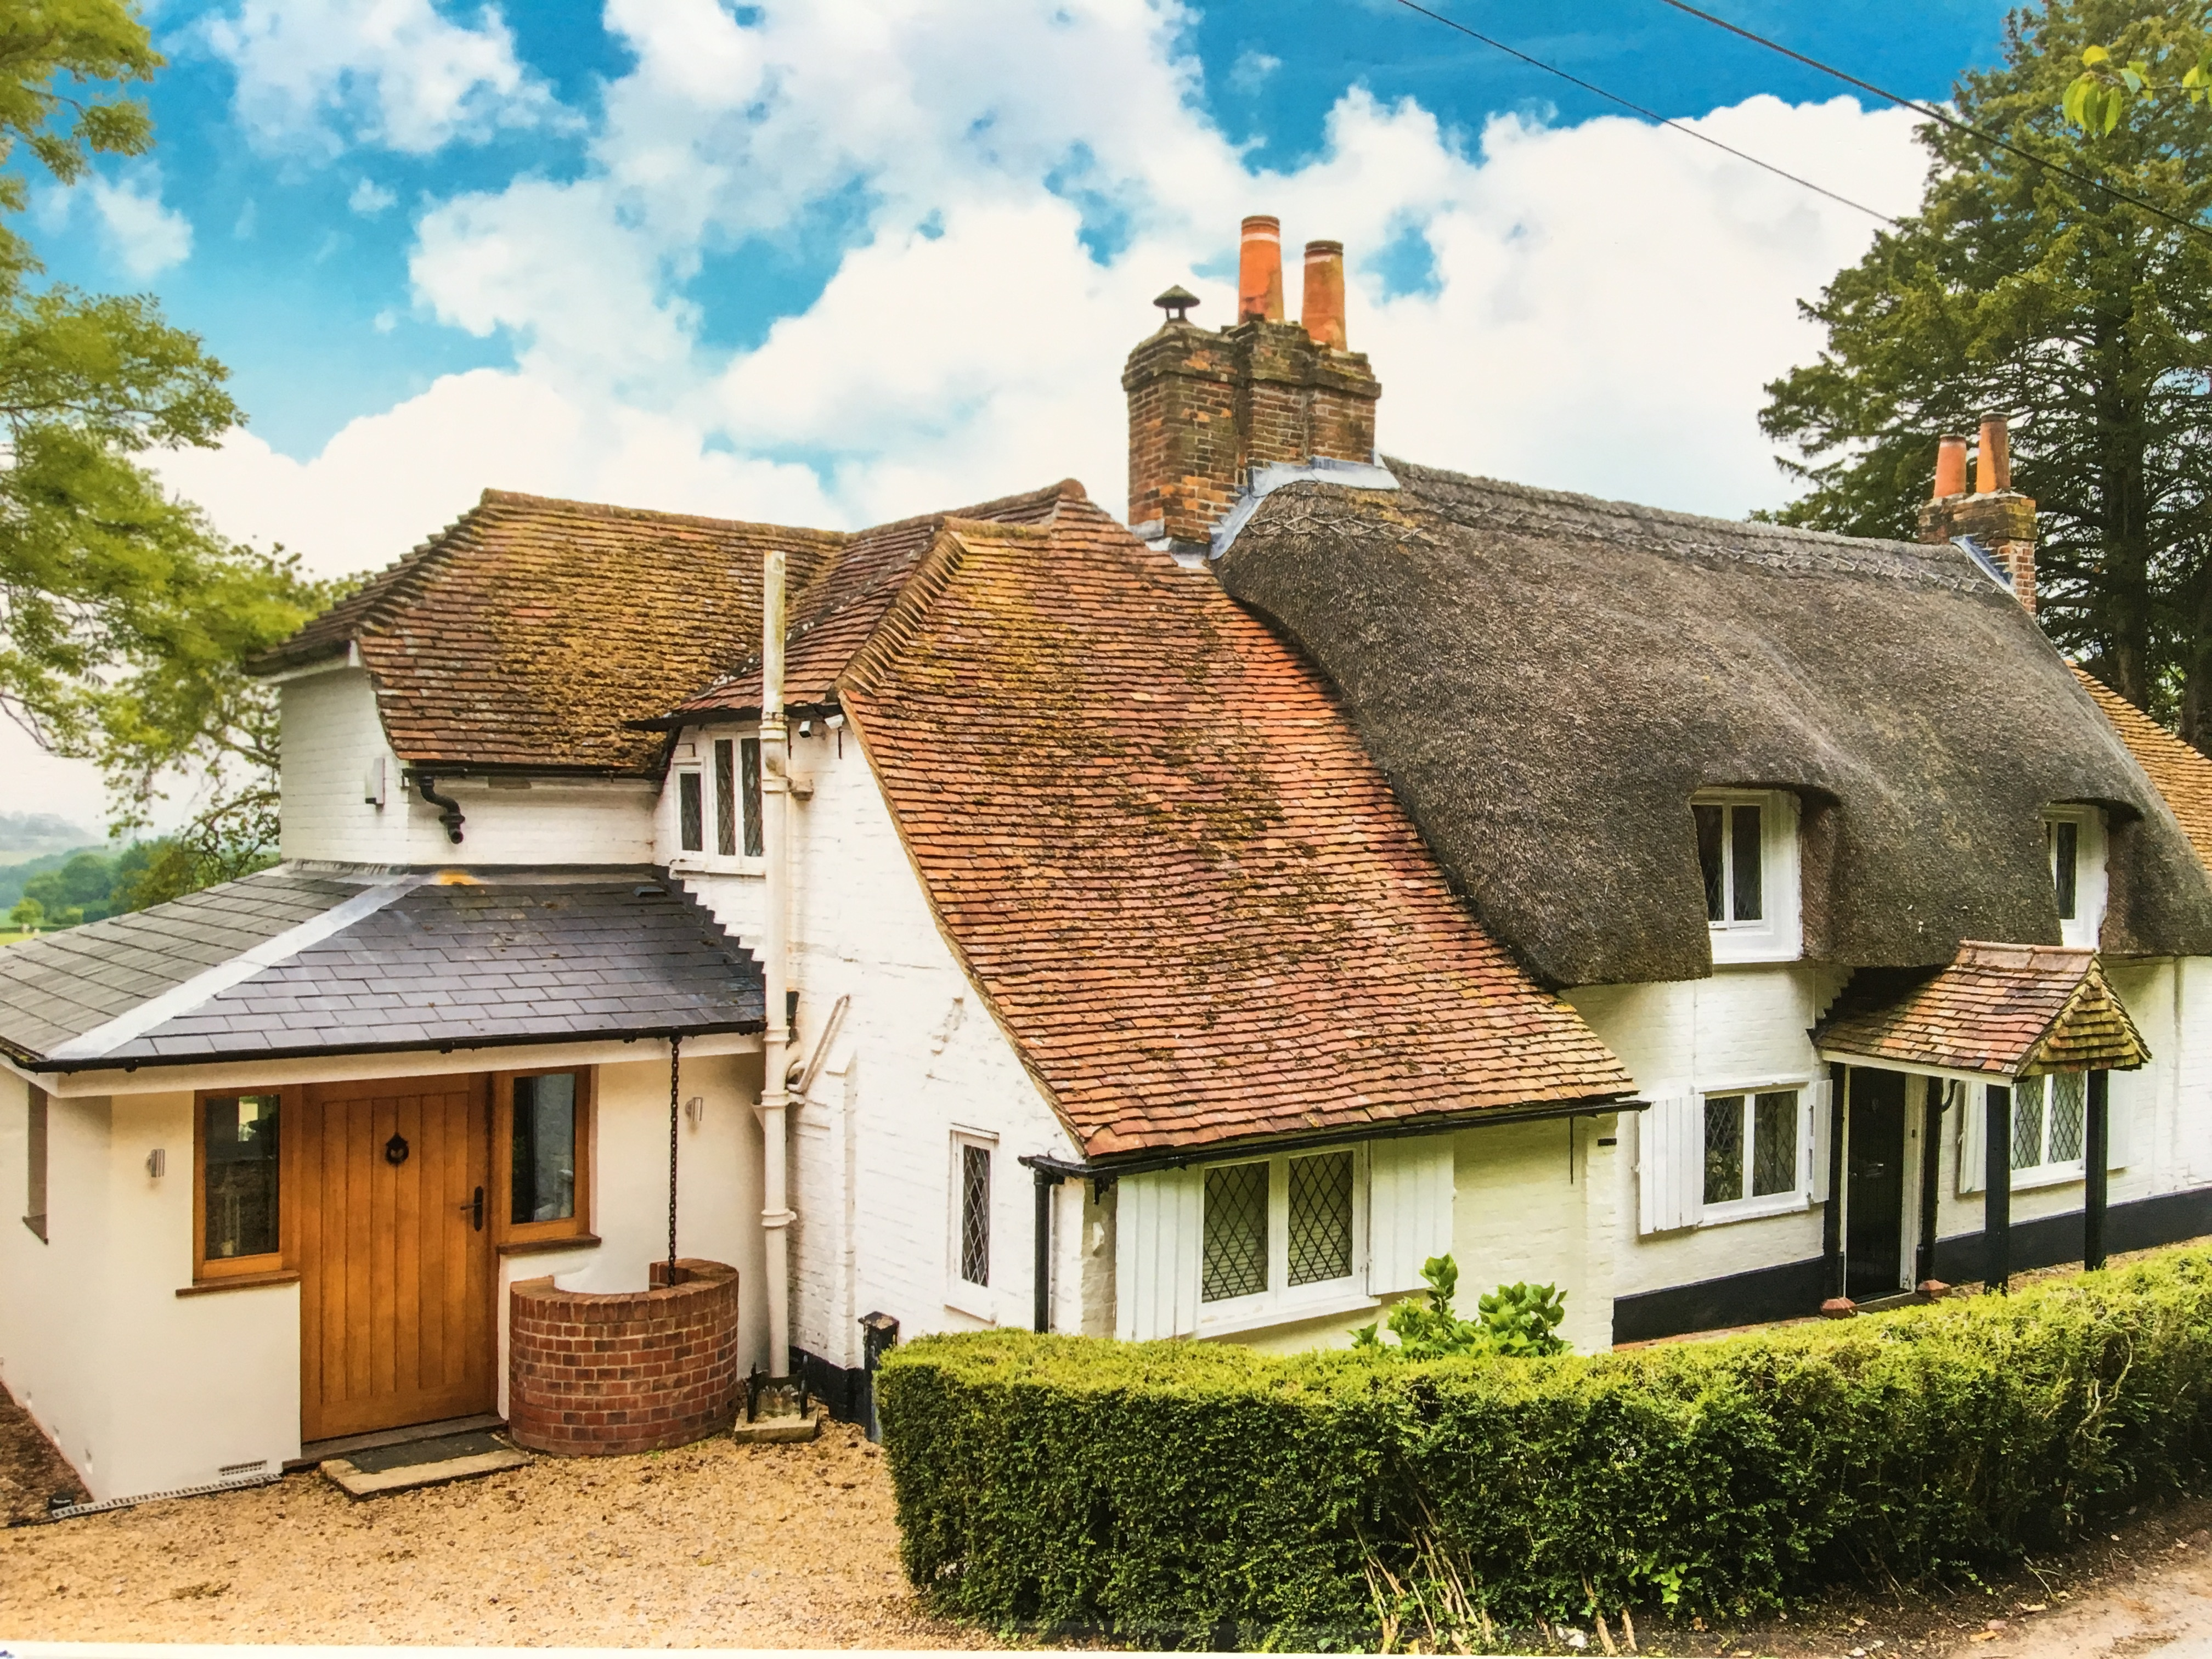 Beautiful English Country Cottage - unrivalled location - Kodinvaihto